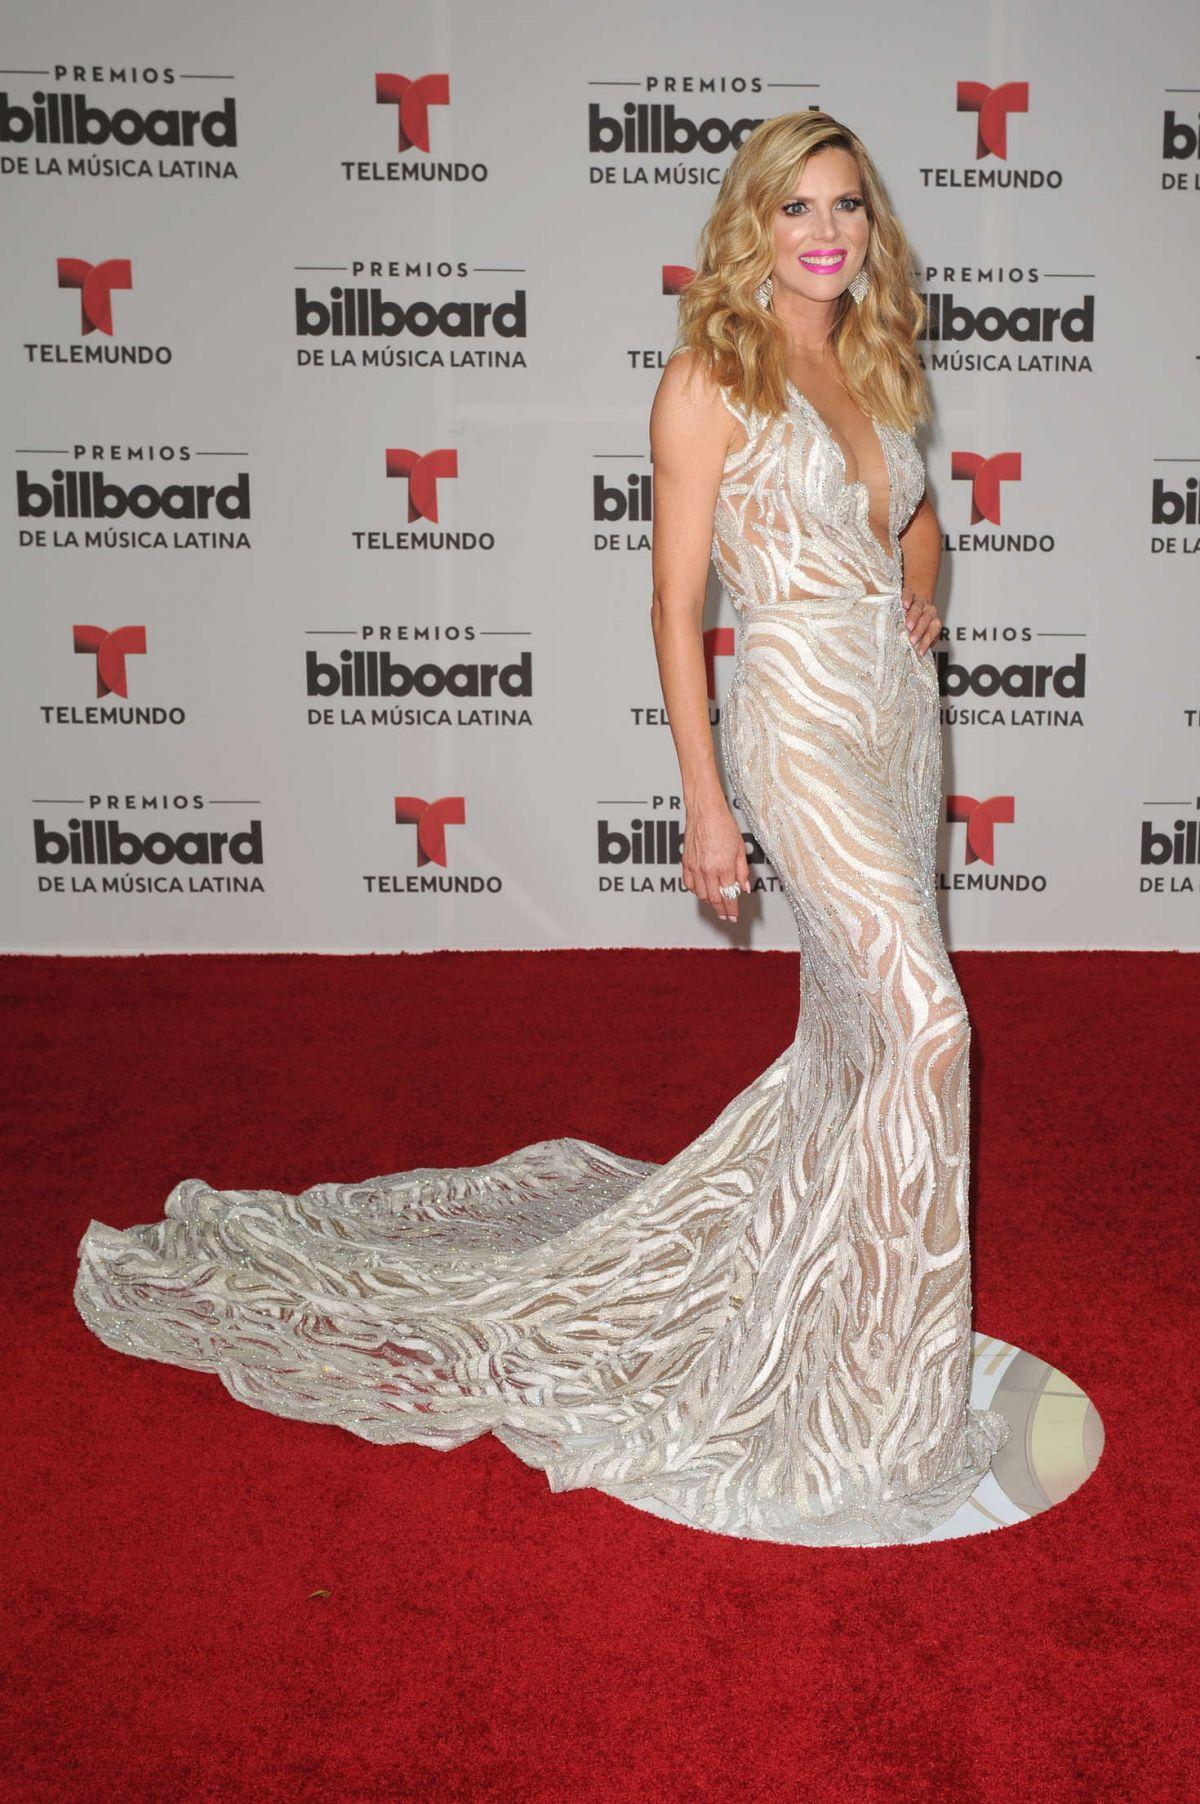 MARITZA RODRIGUEZ at Billboard Latin Music Awards in Miami 04/28/2016